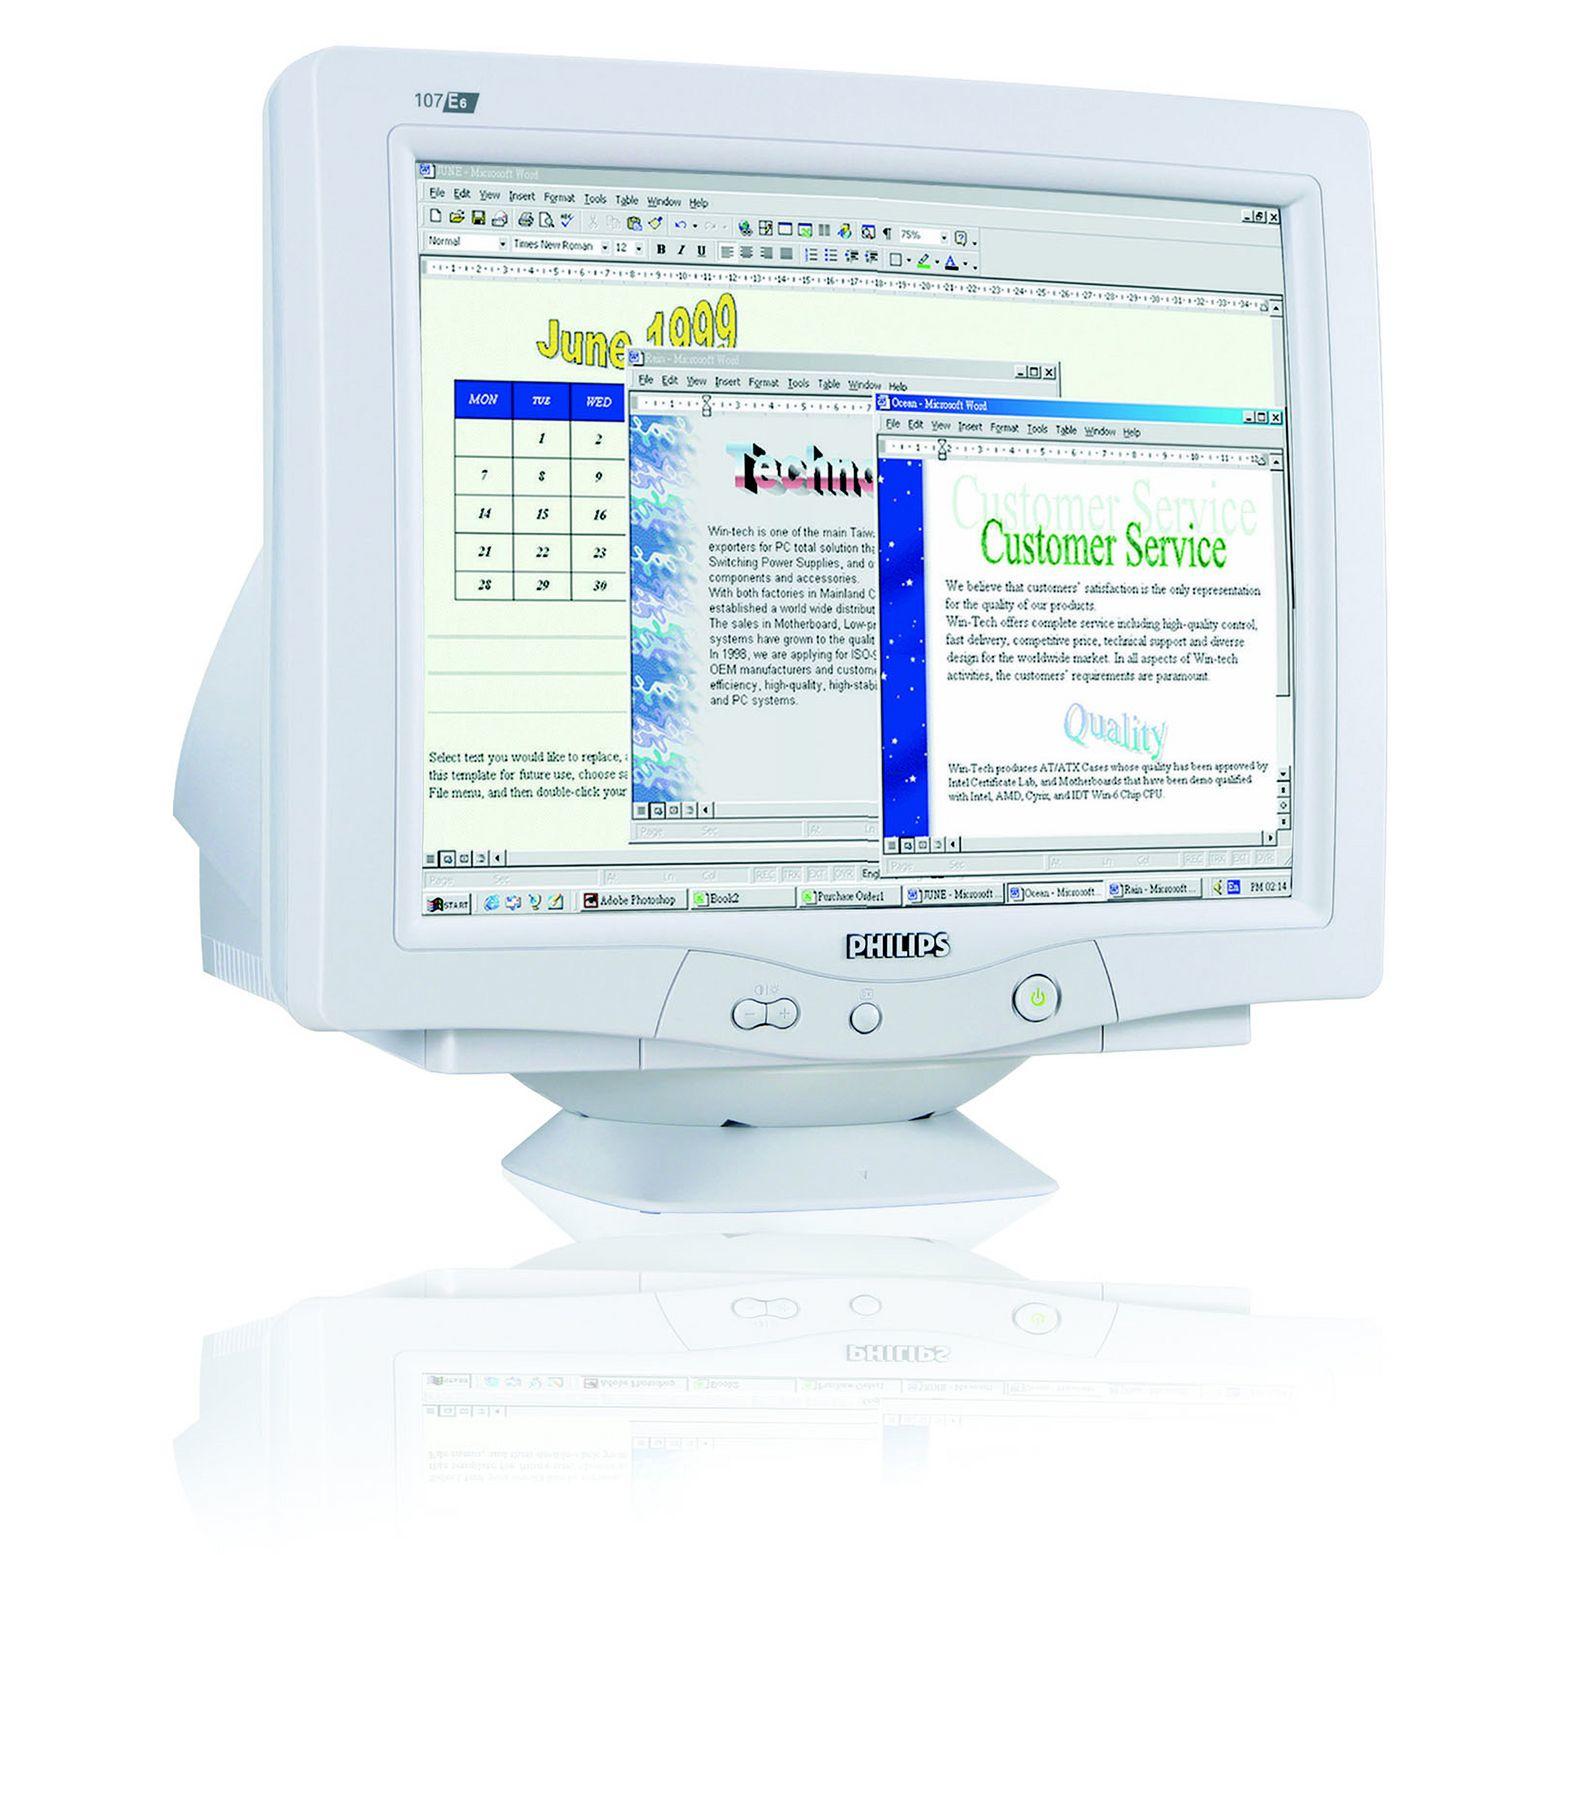 Philips 107E60/00 monitor CRT